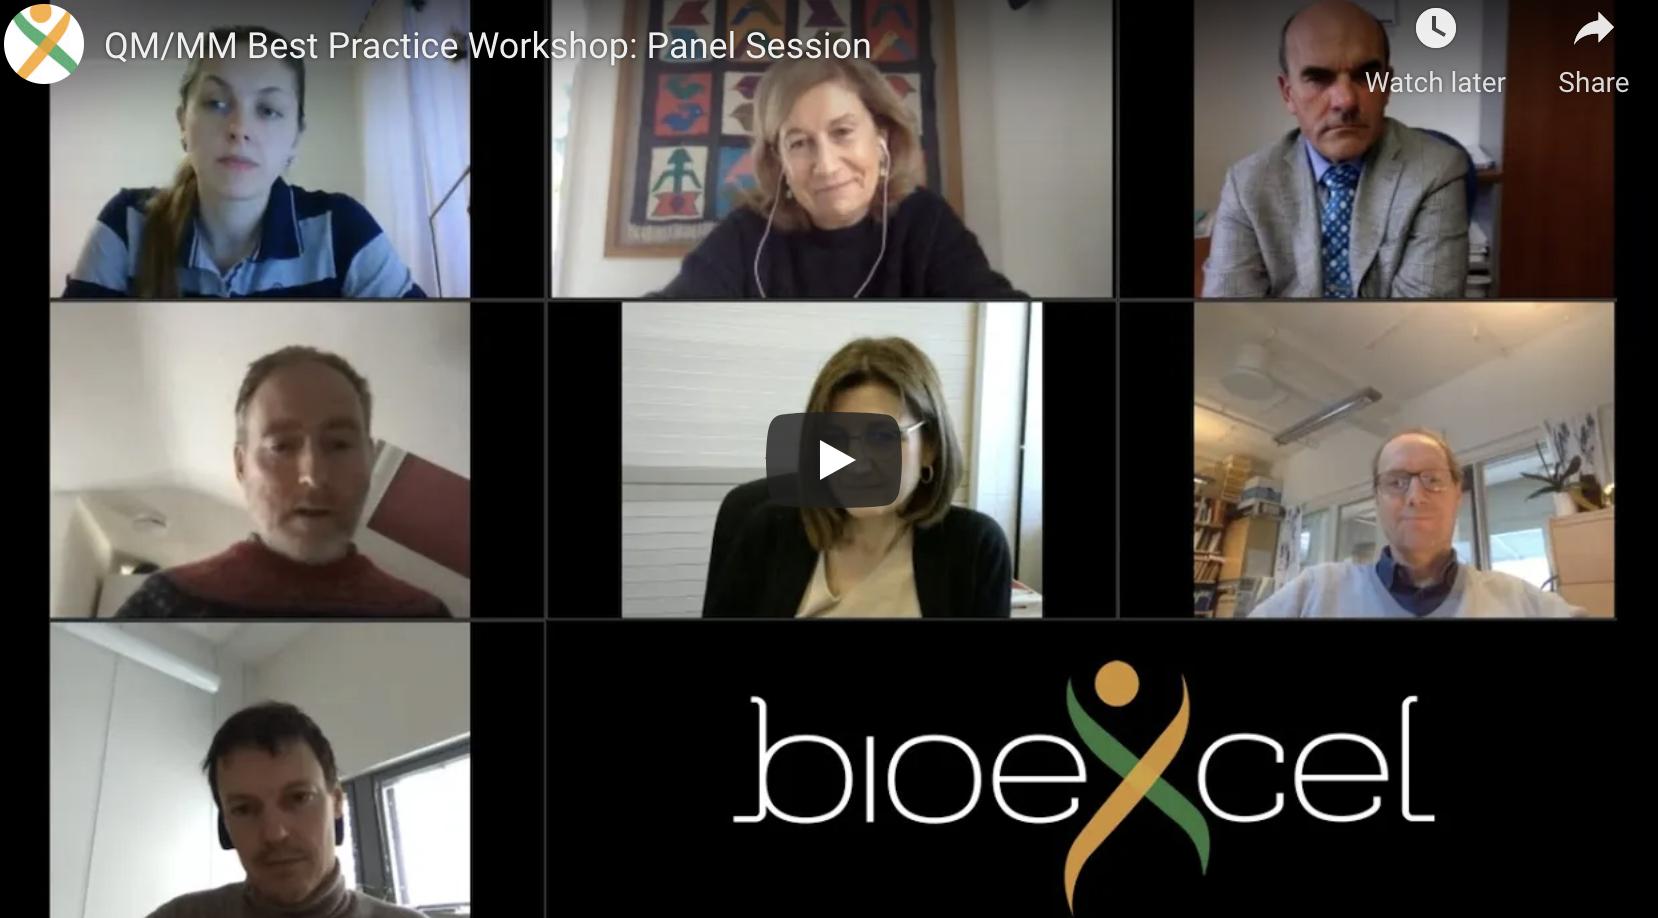 7 people in frame with bioexcel logo